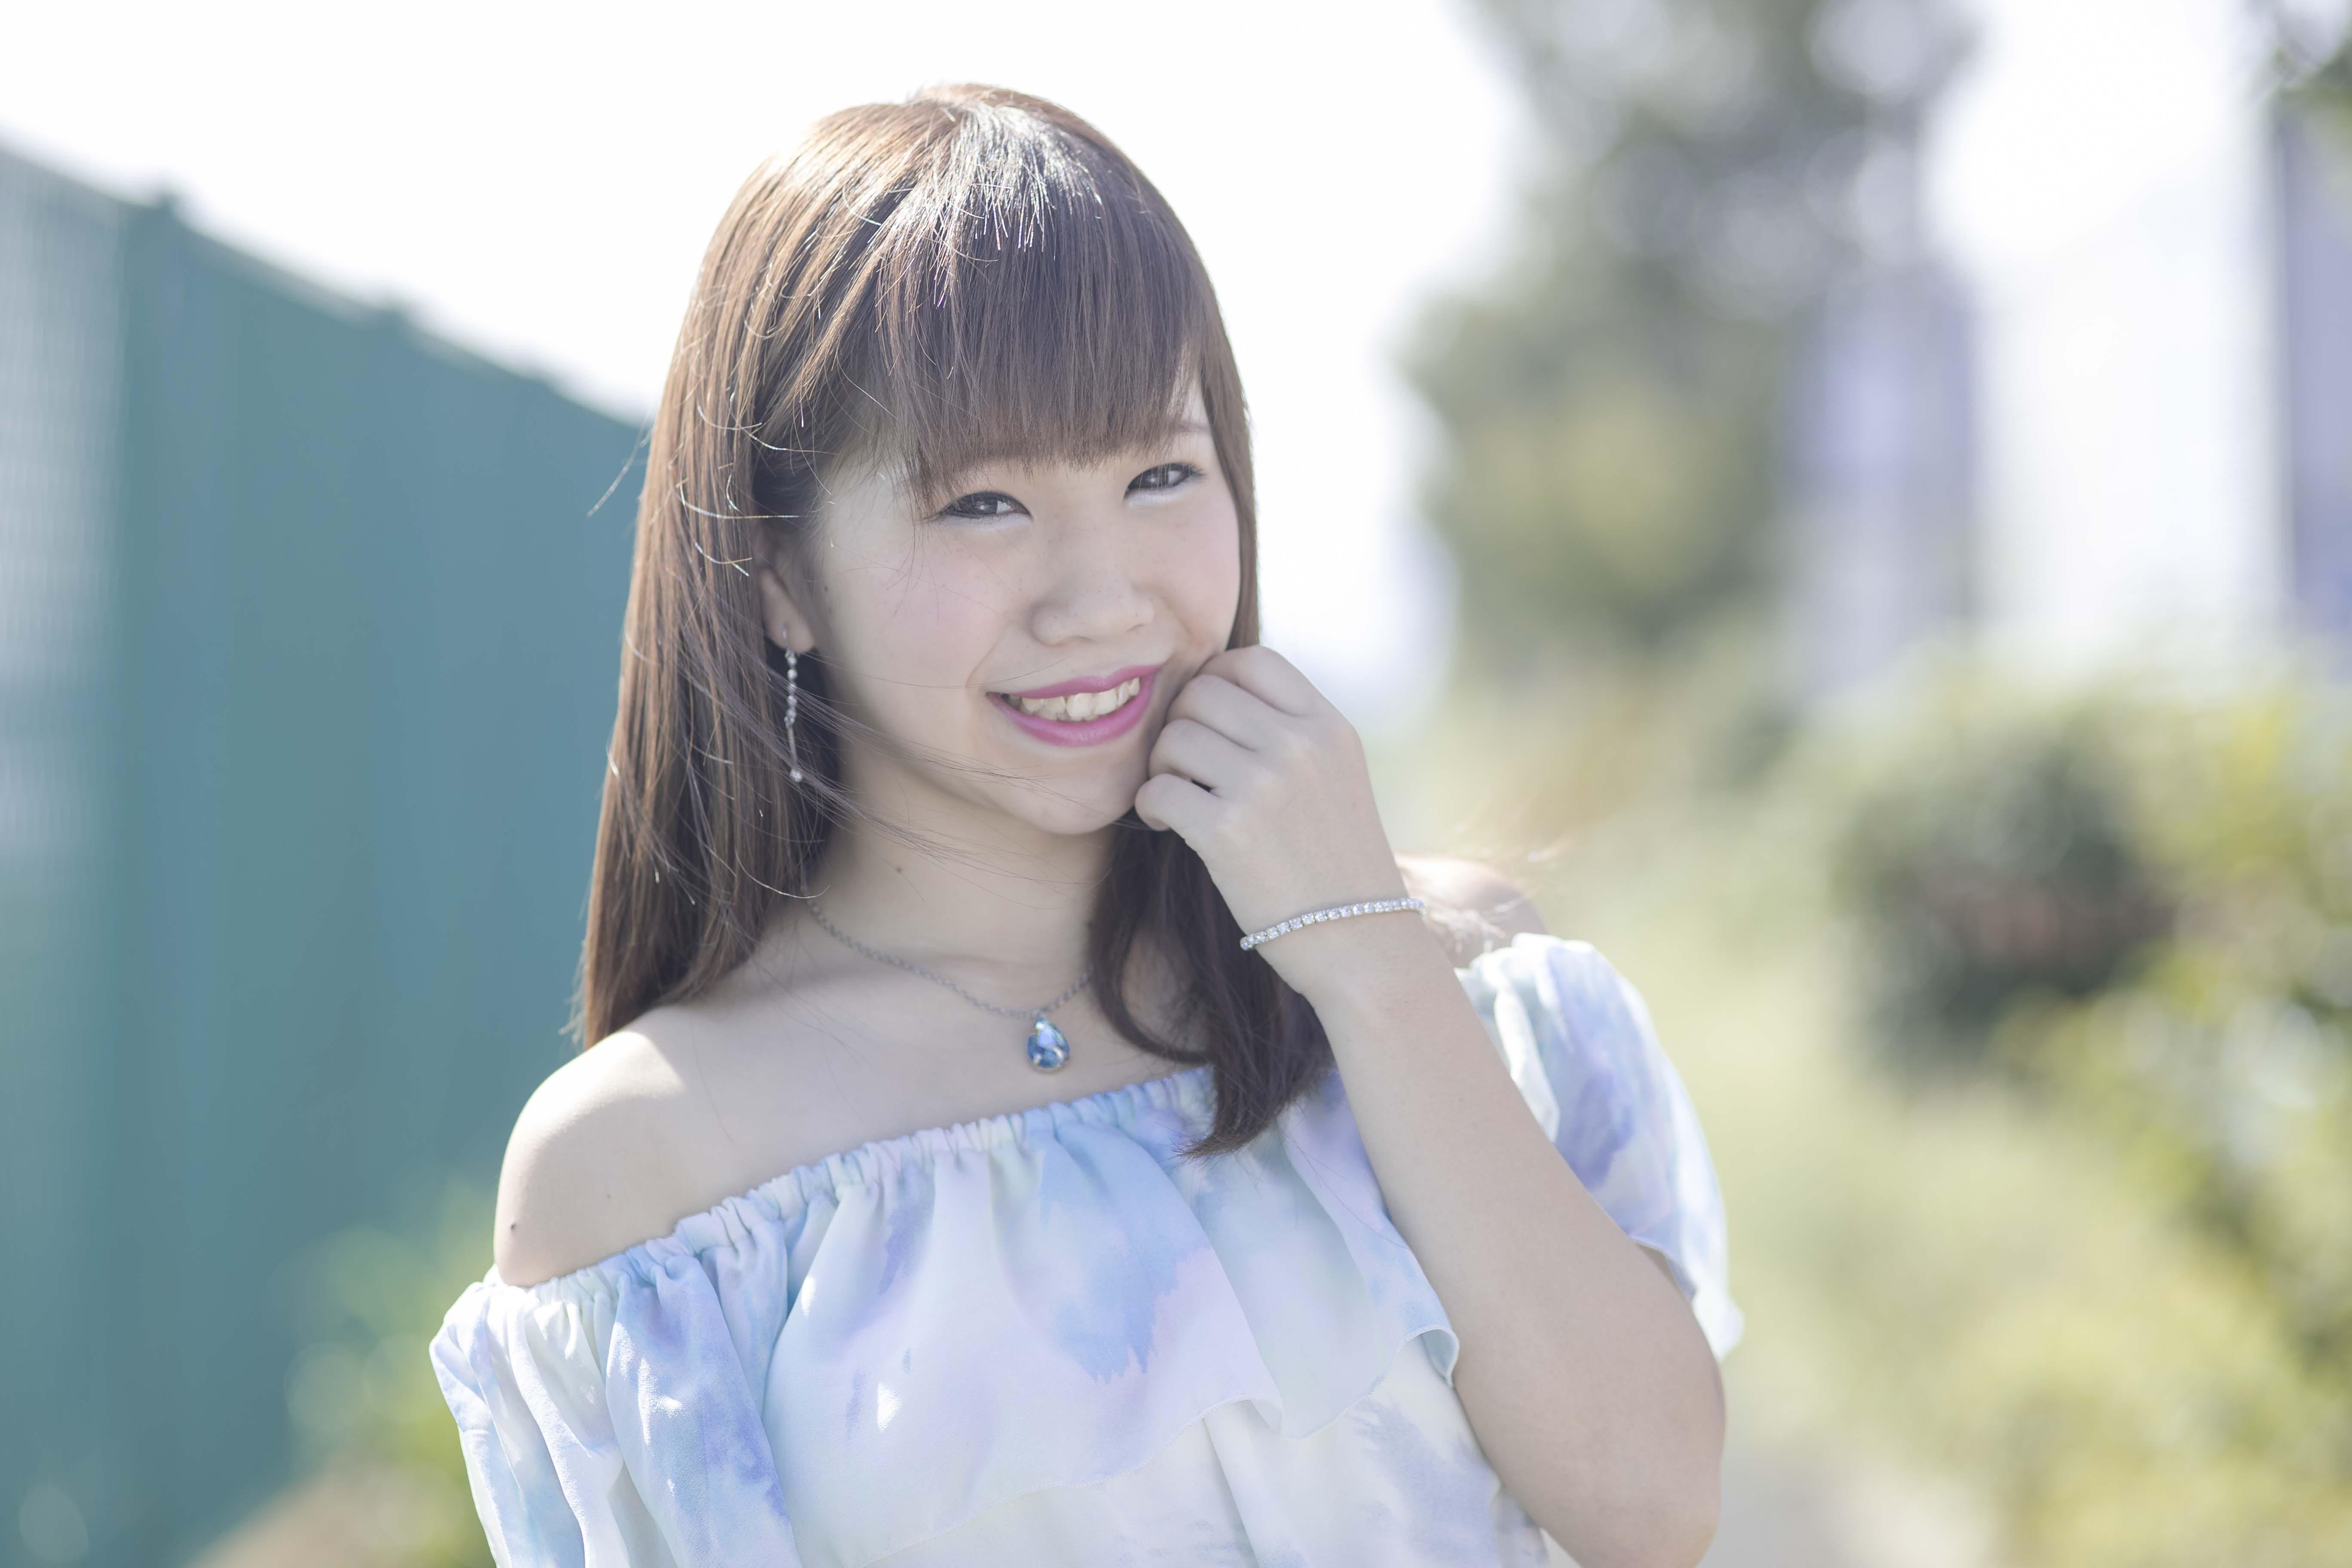 Minisuka Tv Asami Kondouあさみ近藤投稿画像303枚